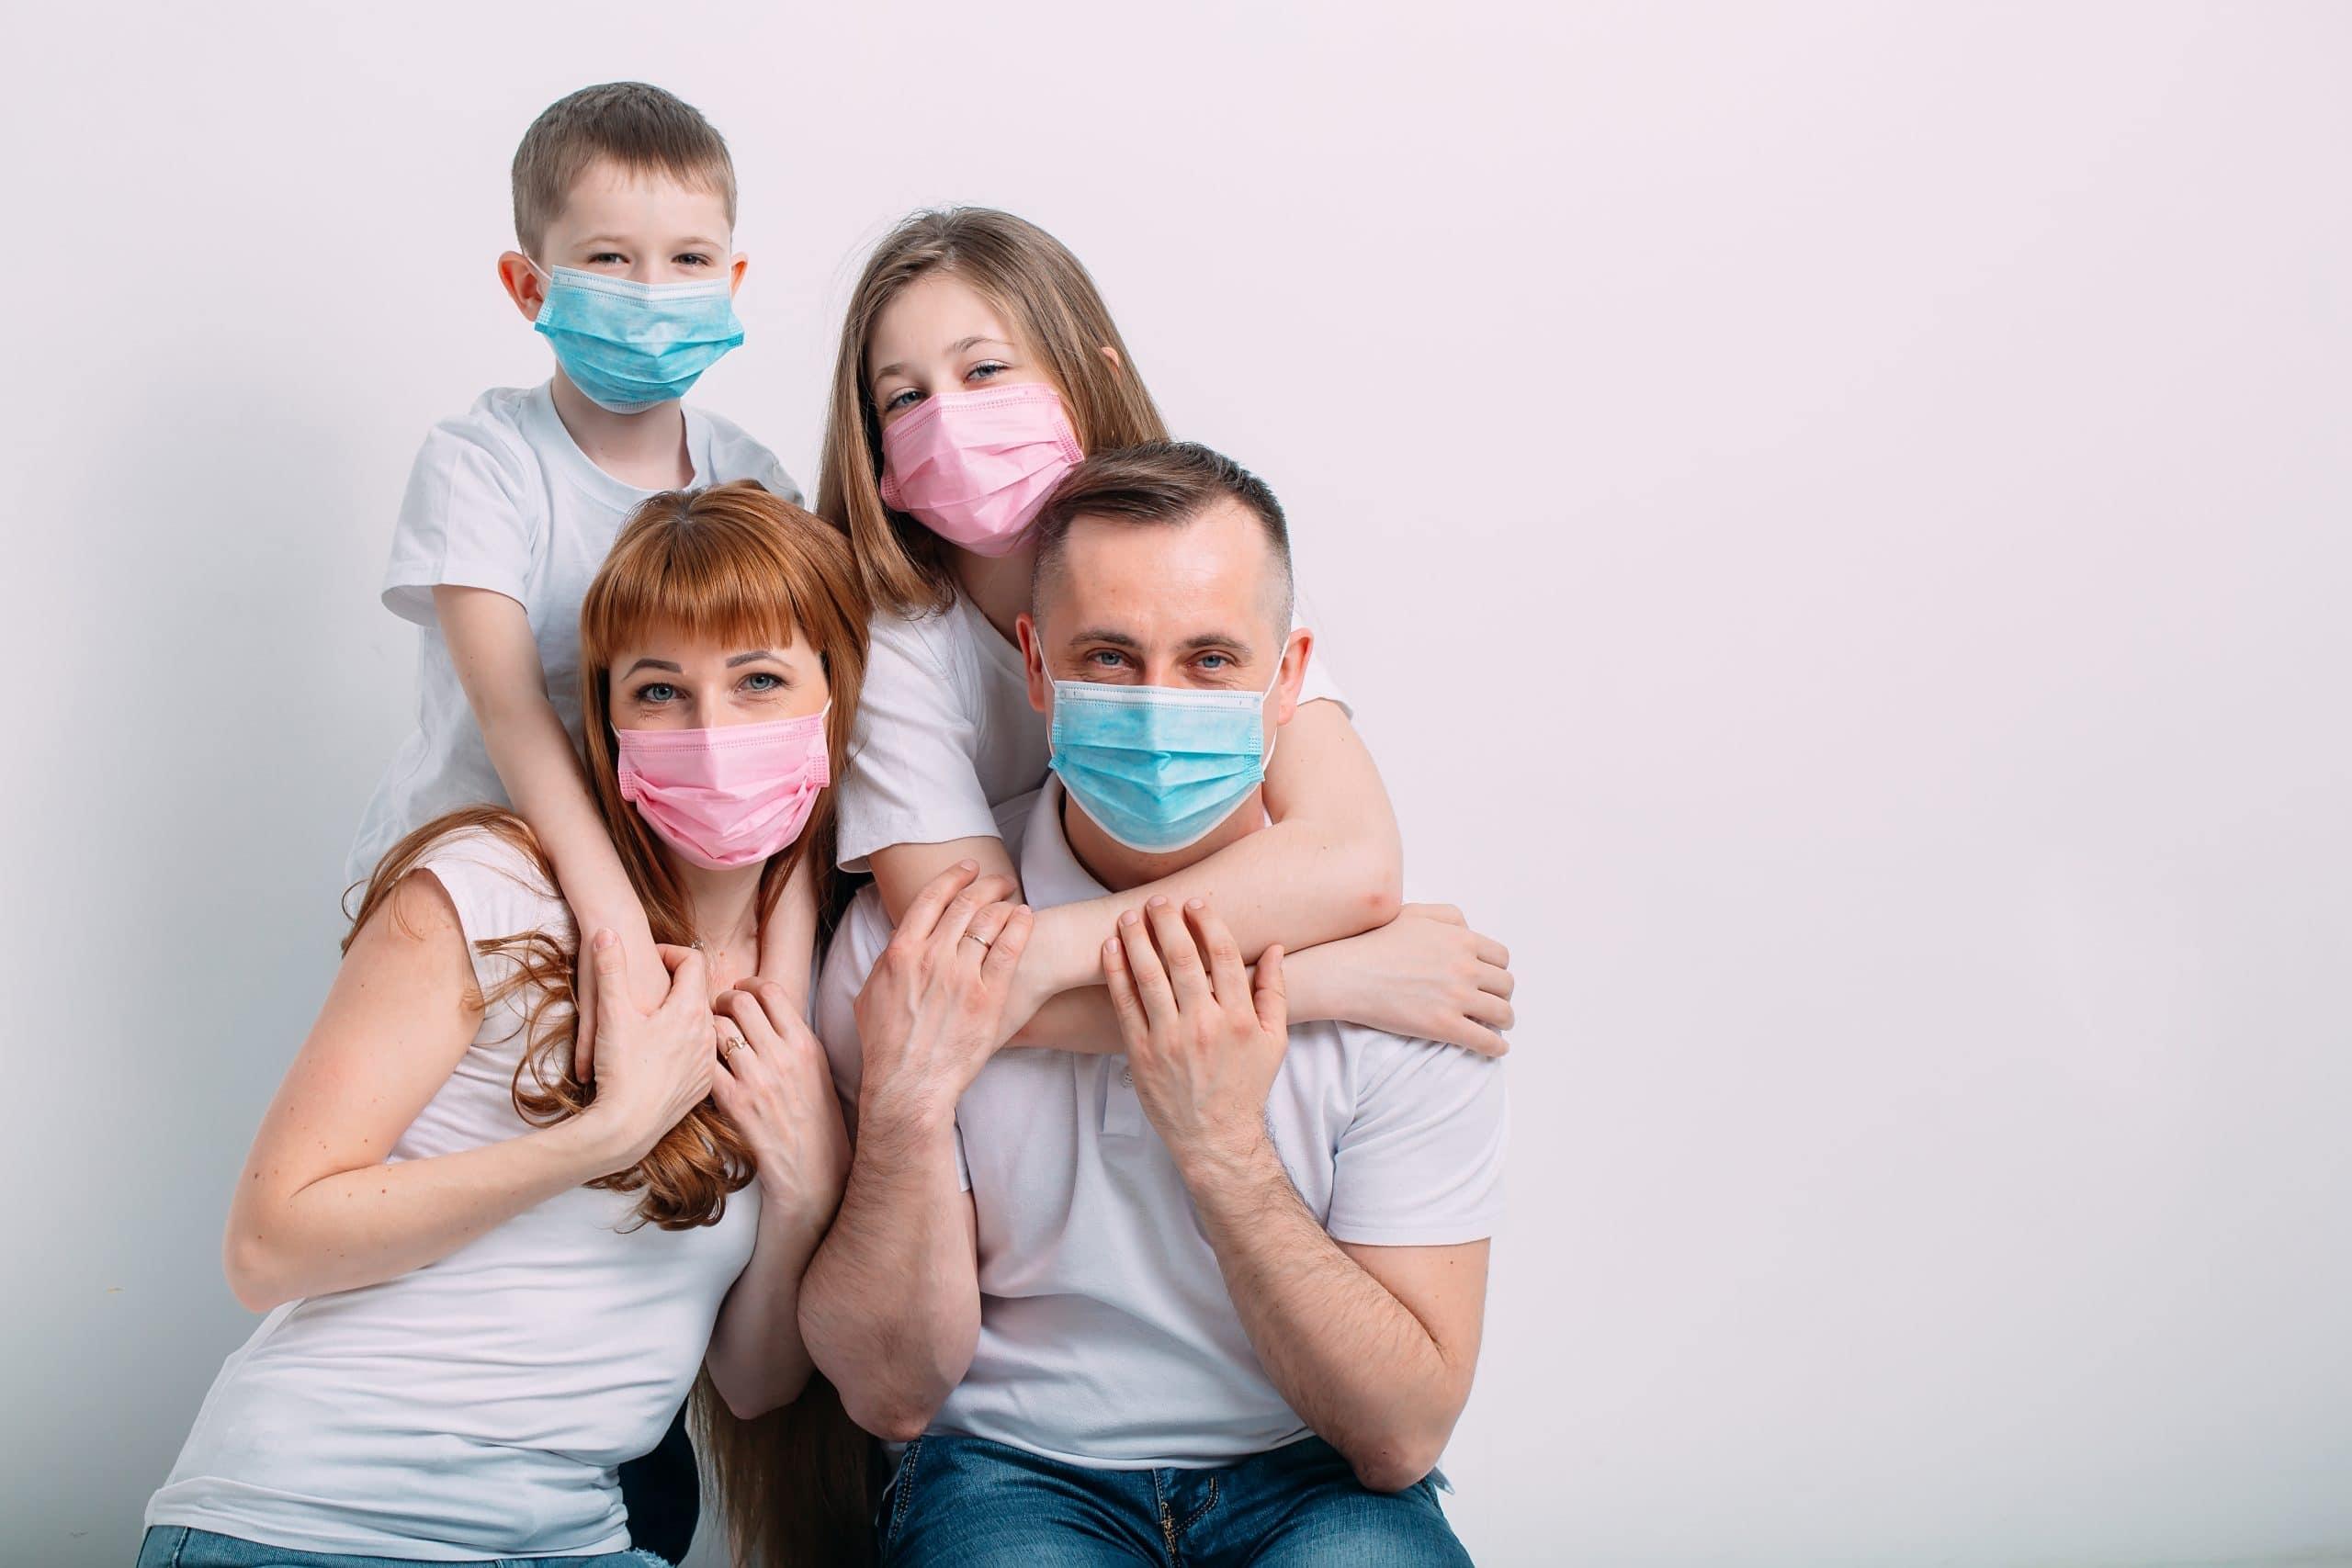 Ways to Help Kids Cope with Coronavirus Fears